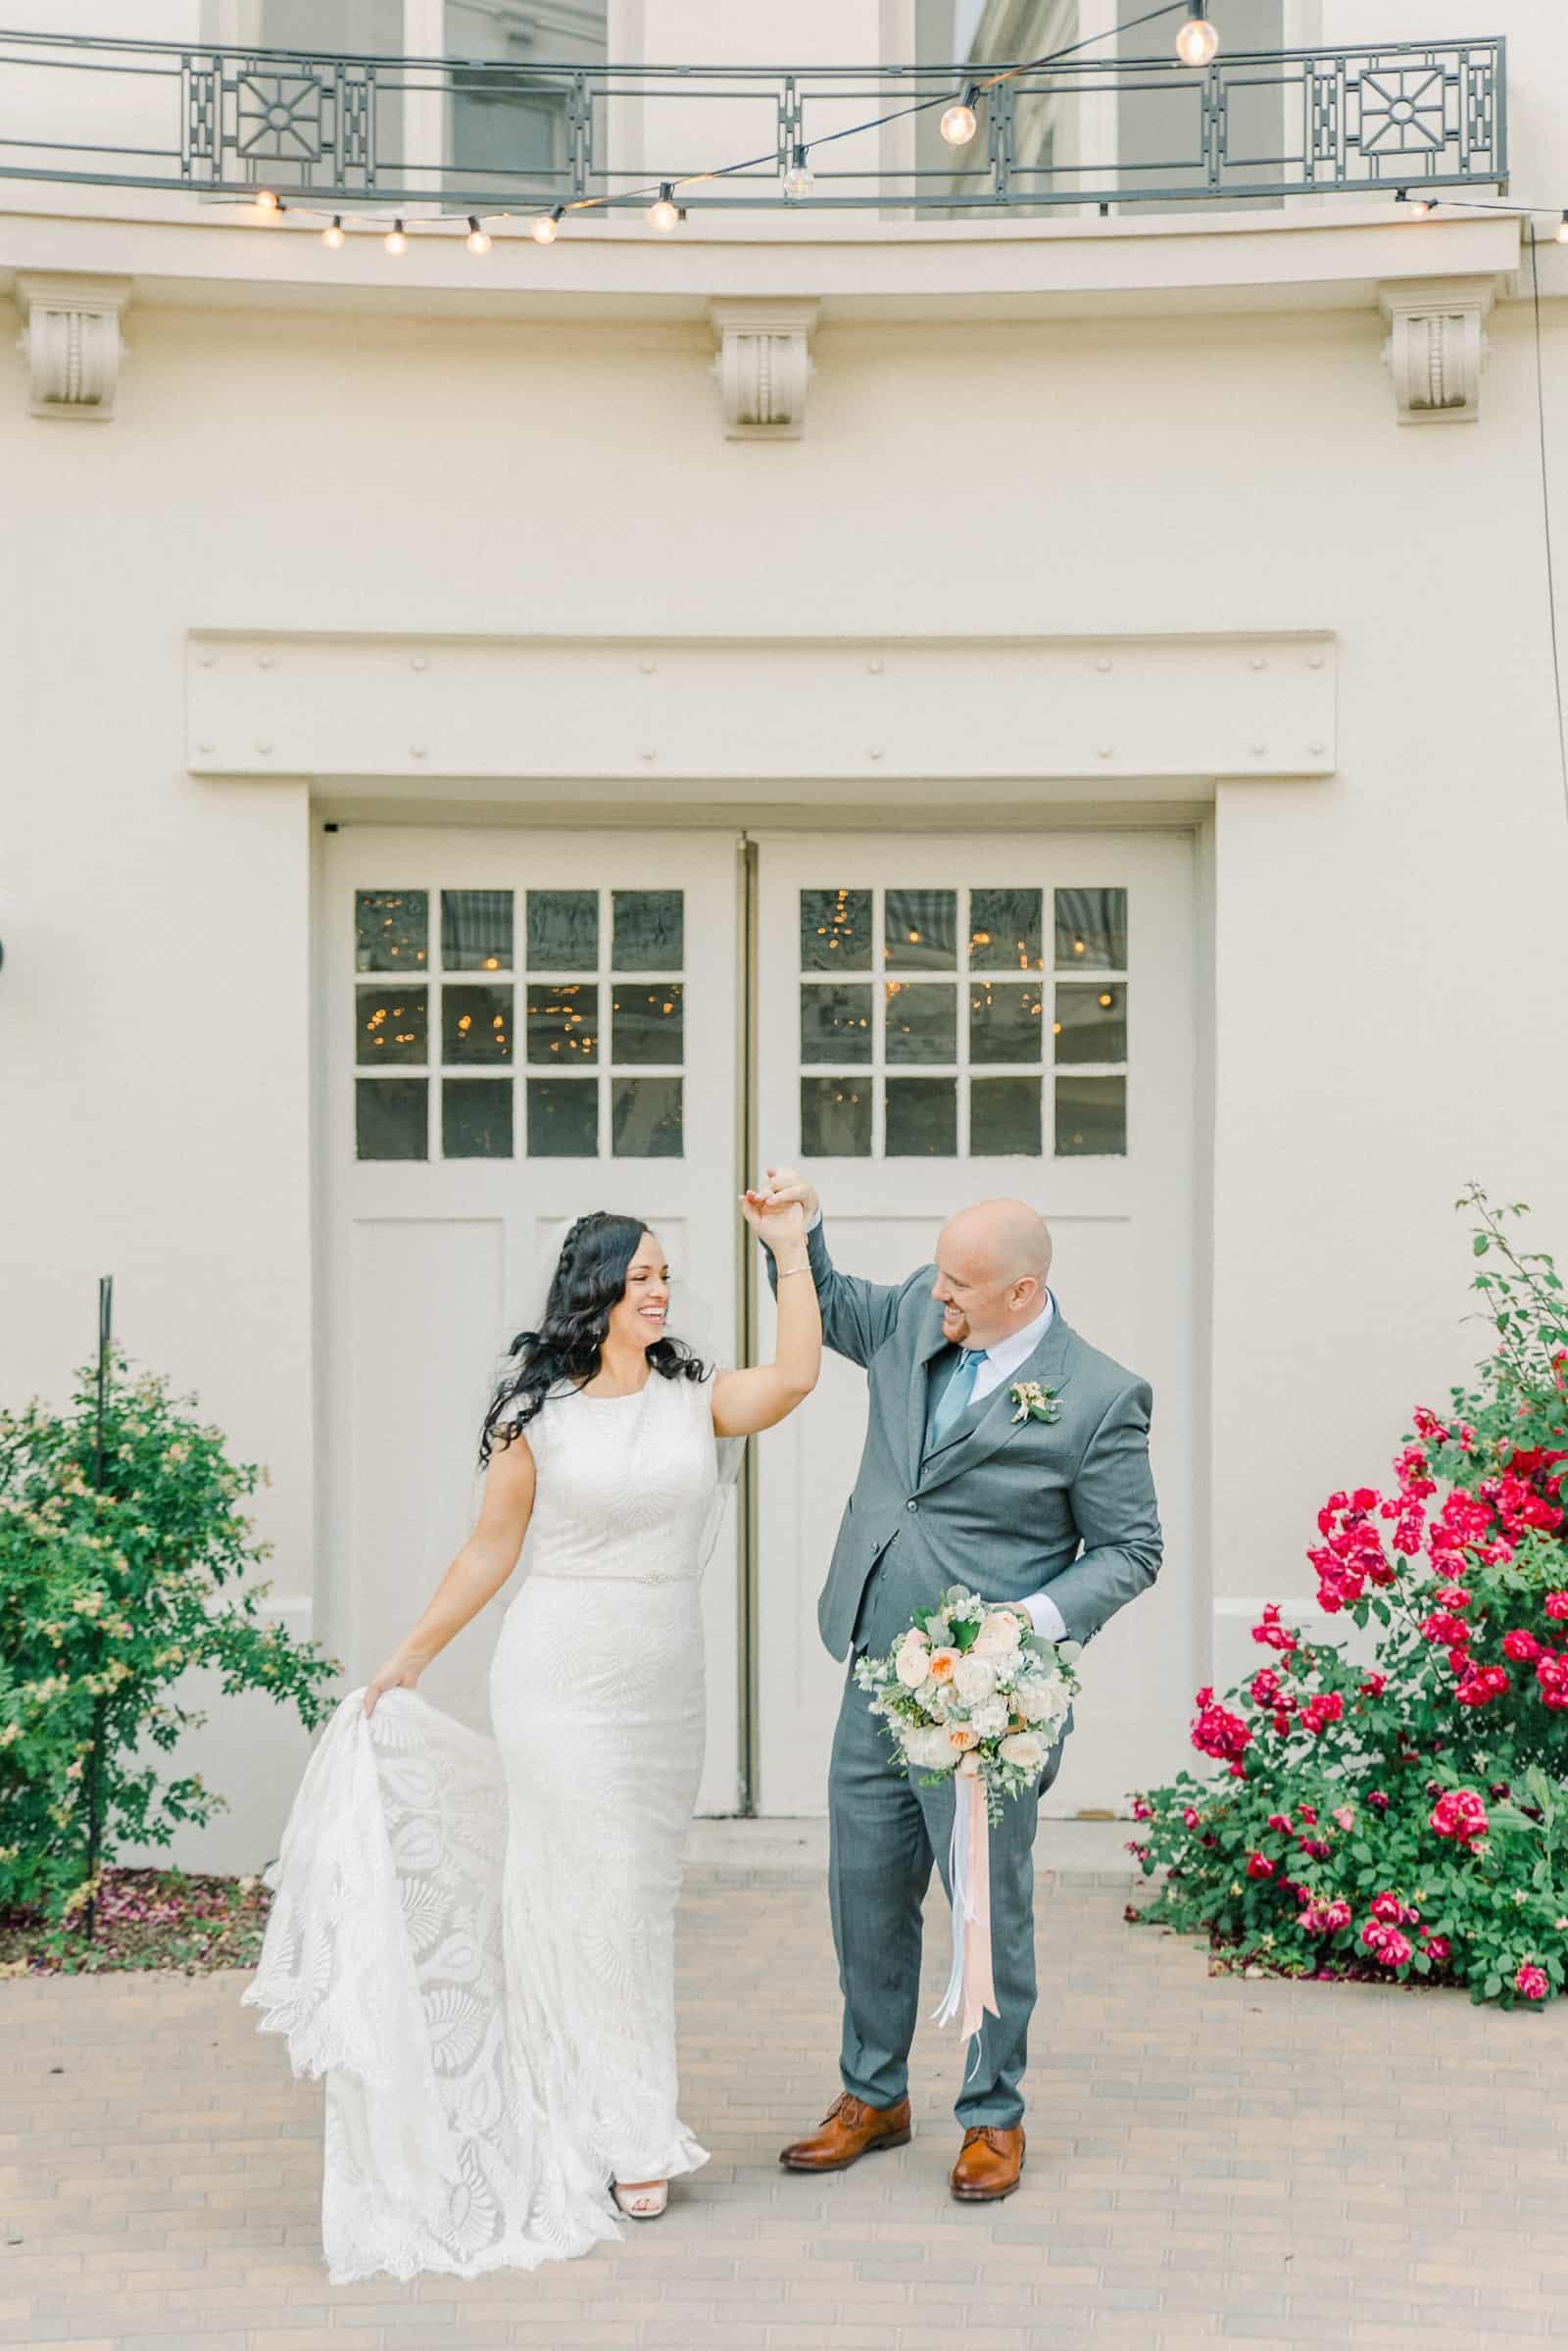 Thomas S. Monson Center Wedding, Salt Lake LDS Temple Wedding, Utah wedding photography. bride and groom first dance